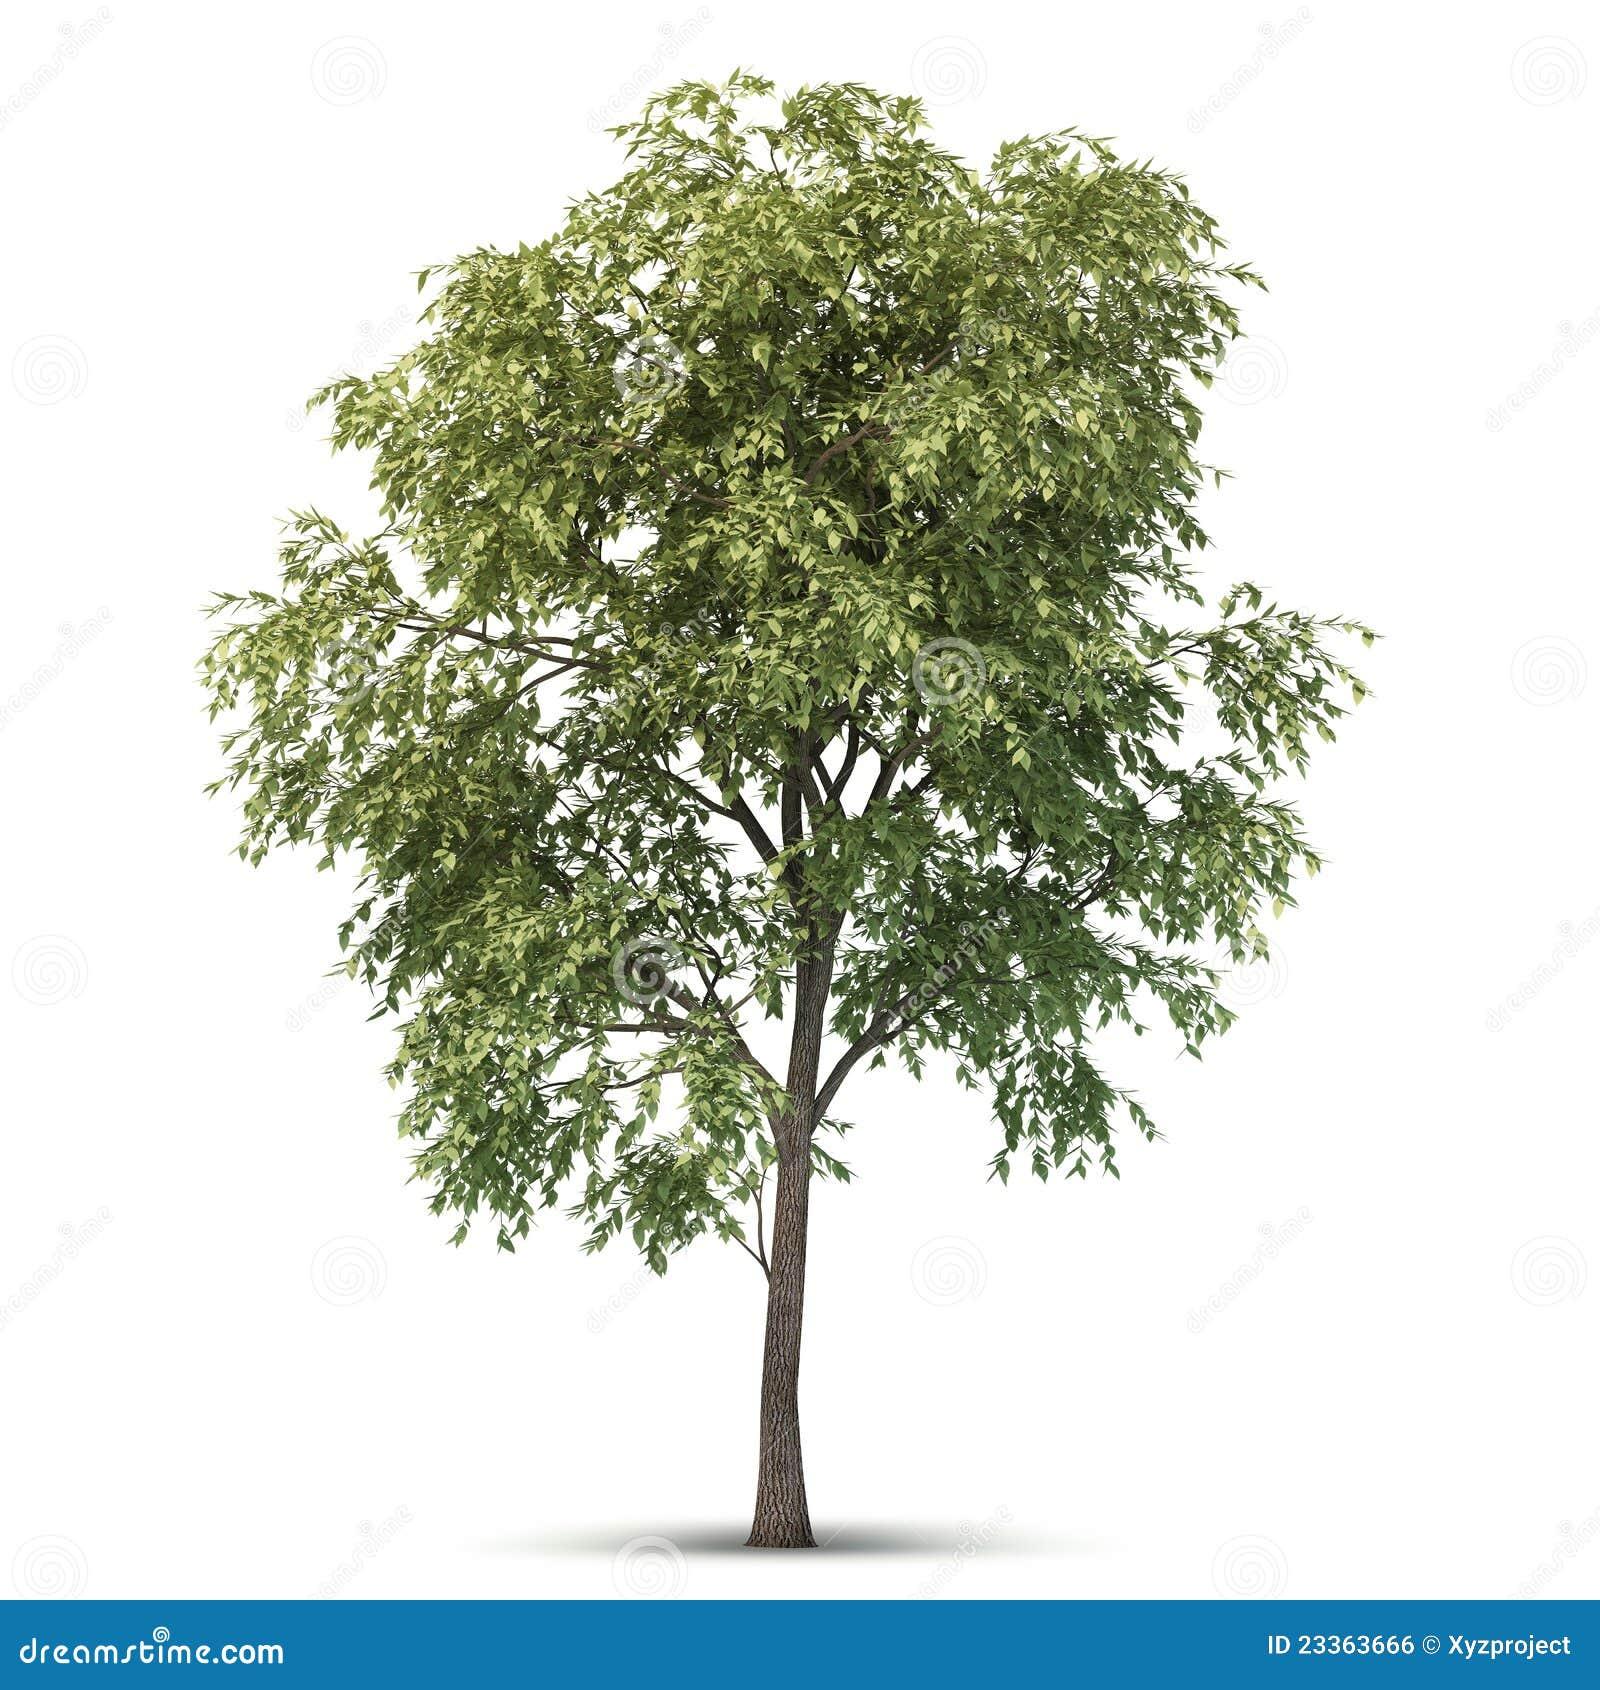 Isolated Tree. Royalty Free Stock Image - Image: 23363666